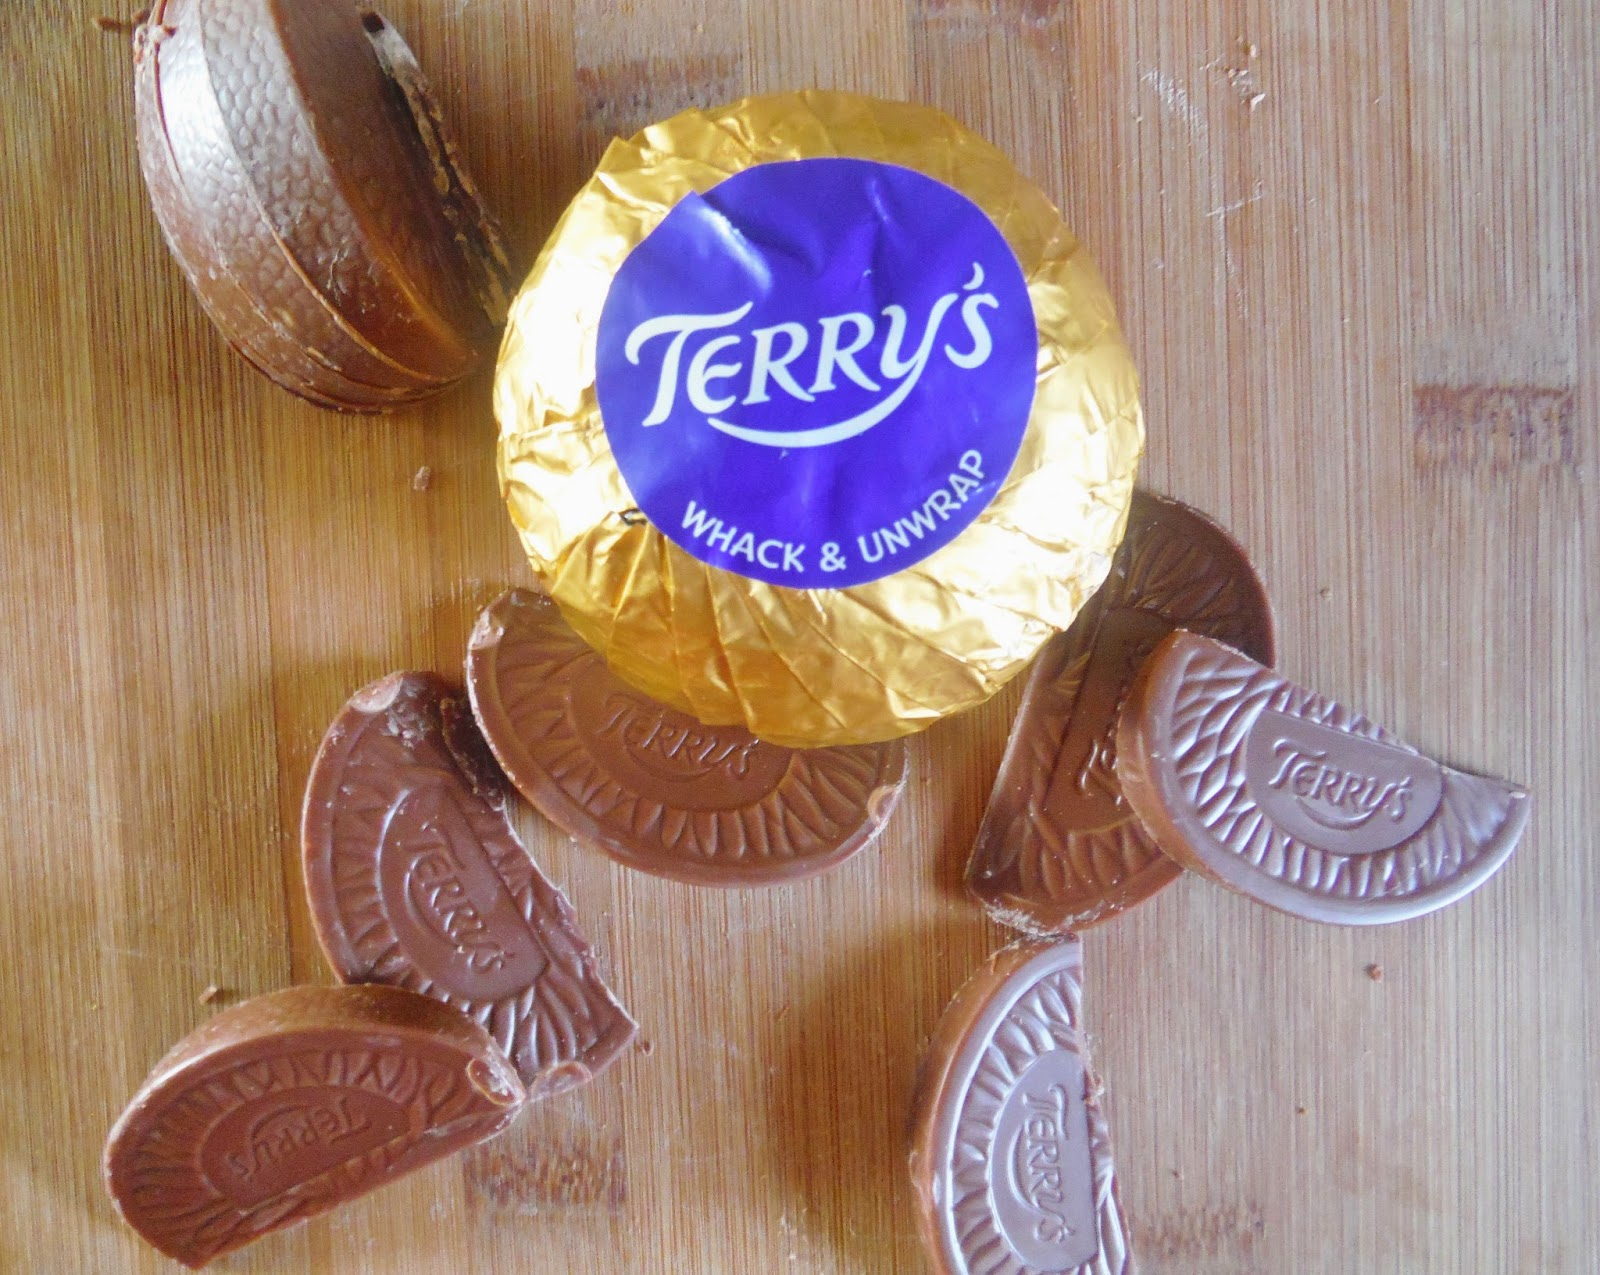 Terry's Chocolate Orange brownies